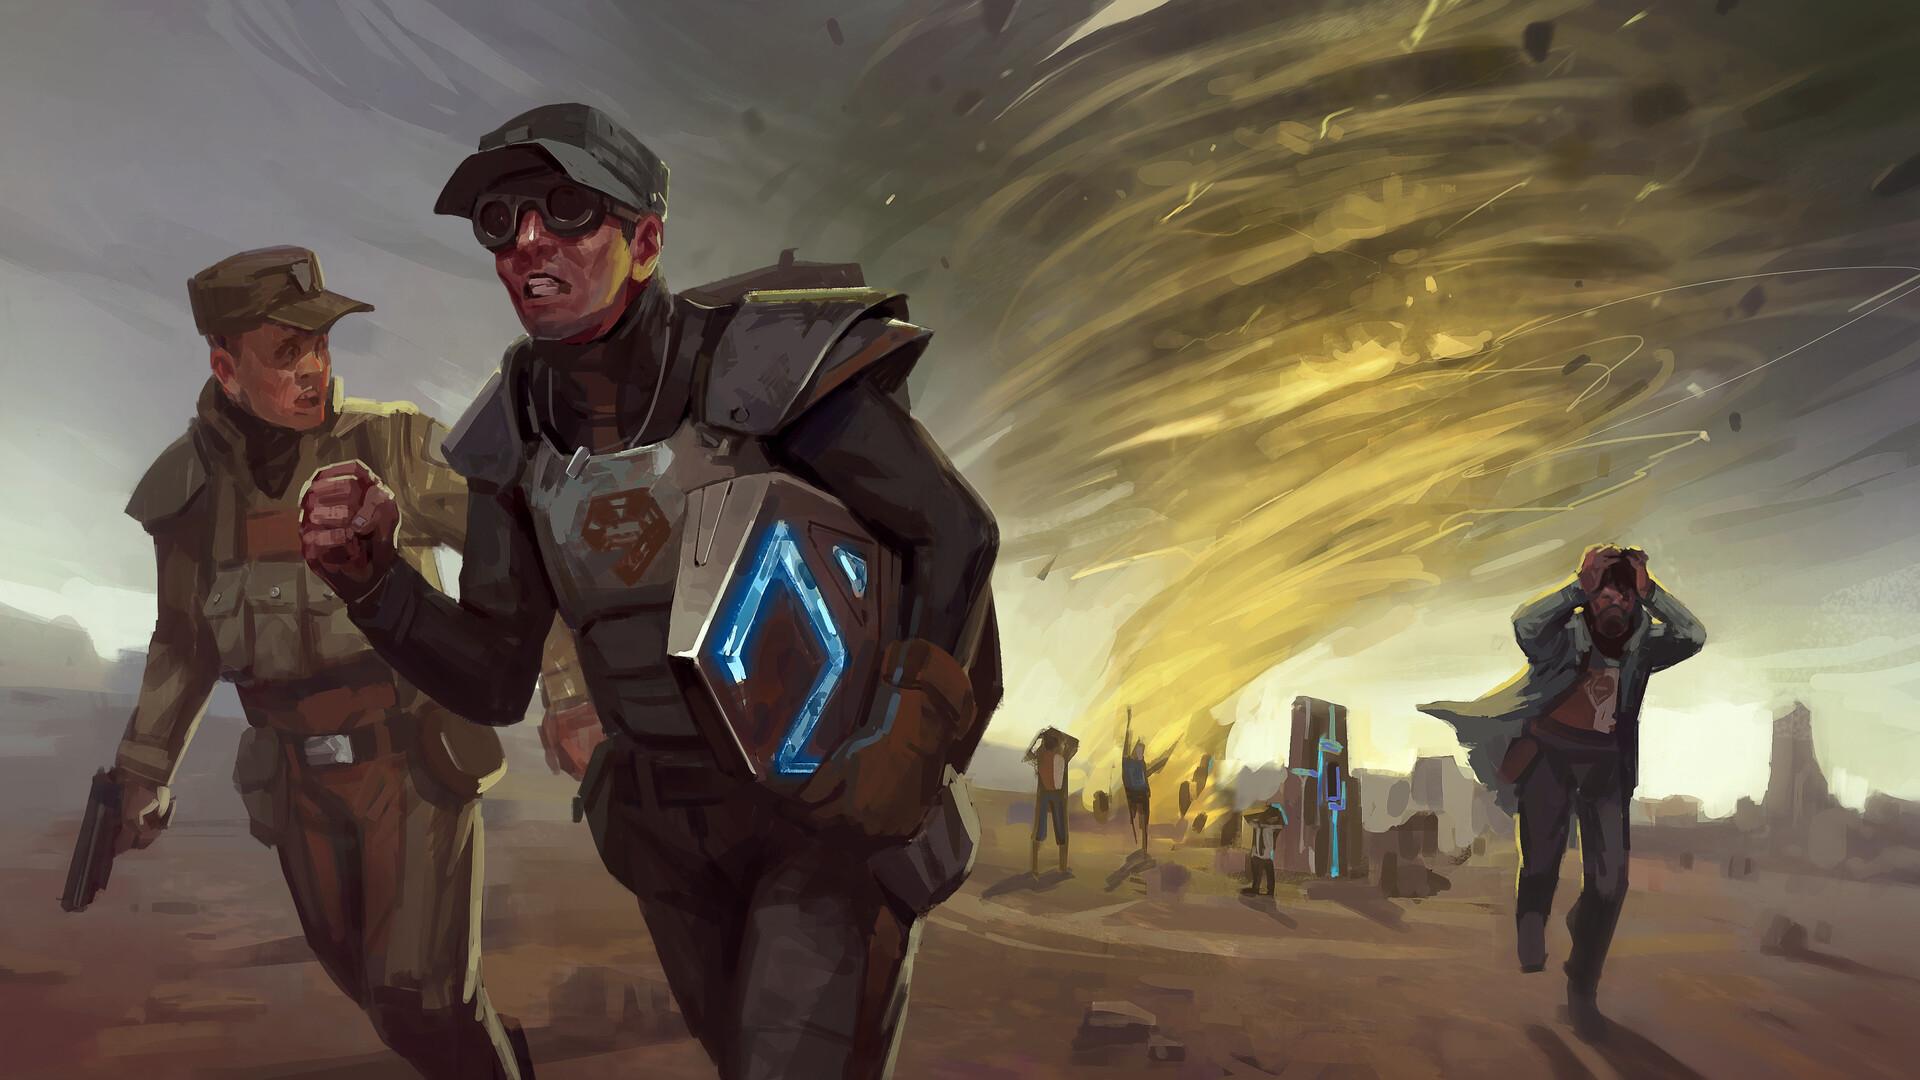 ArtStation - The Dome - Encased RPG, Dark Crystal Games